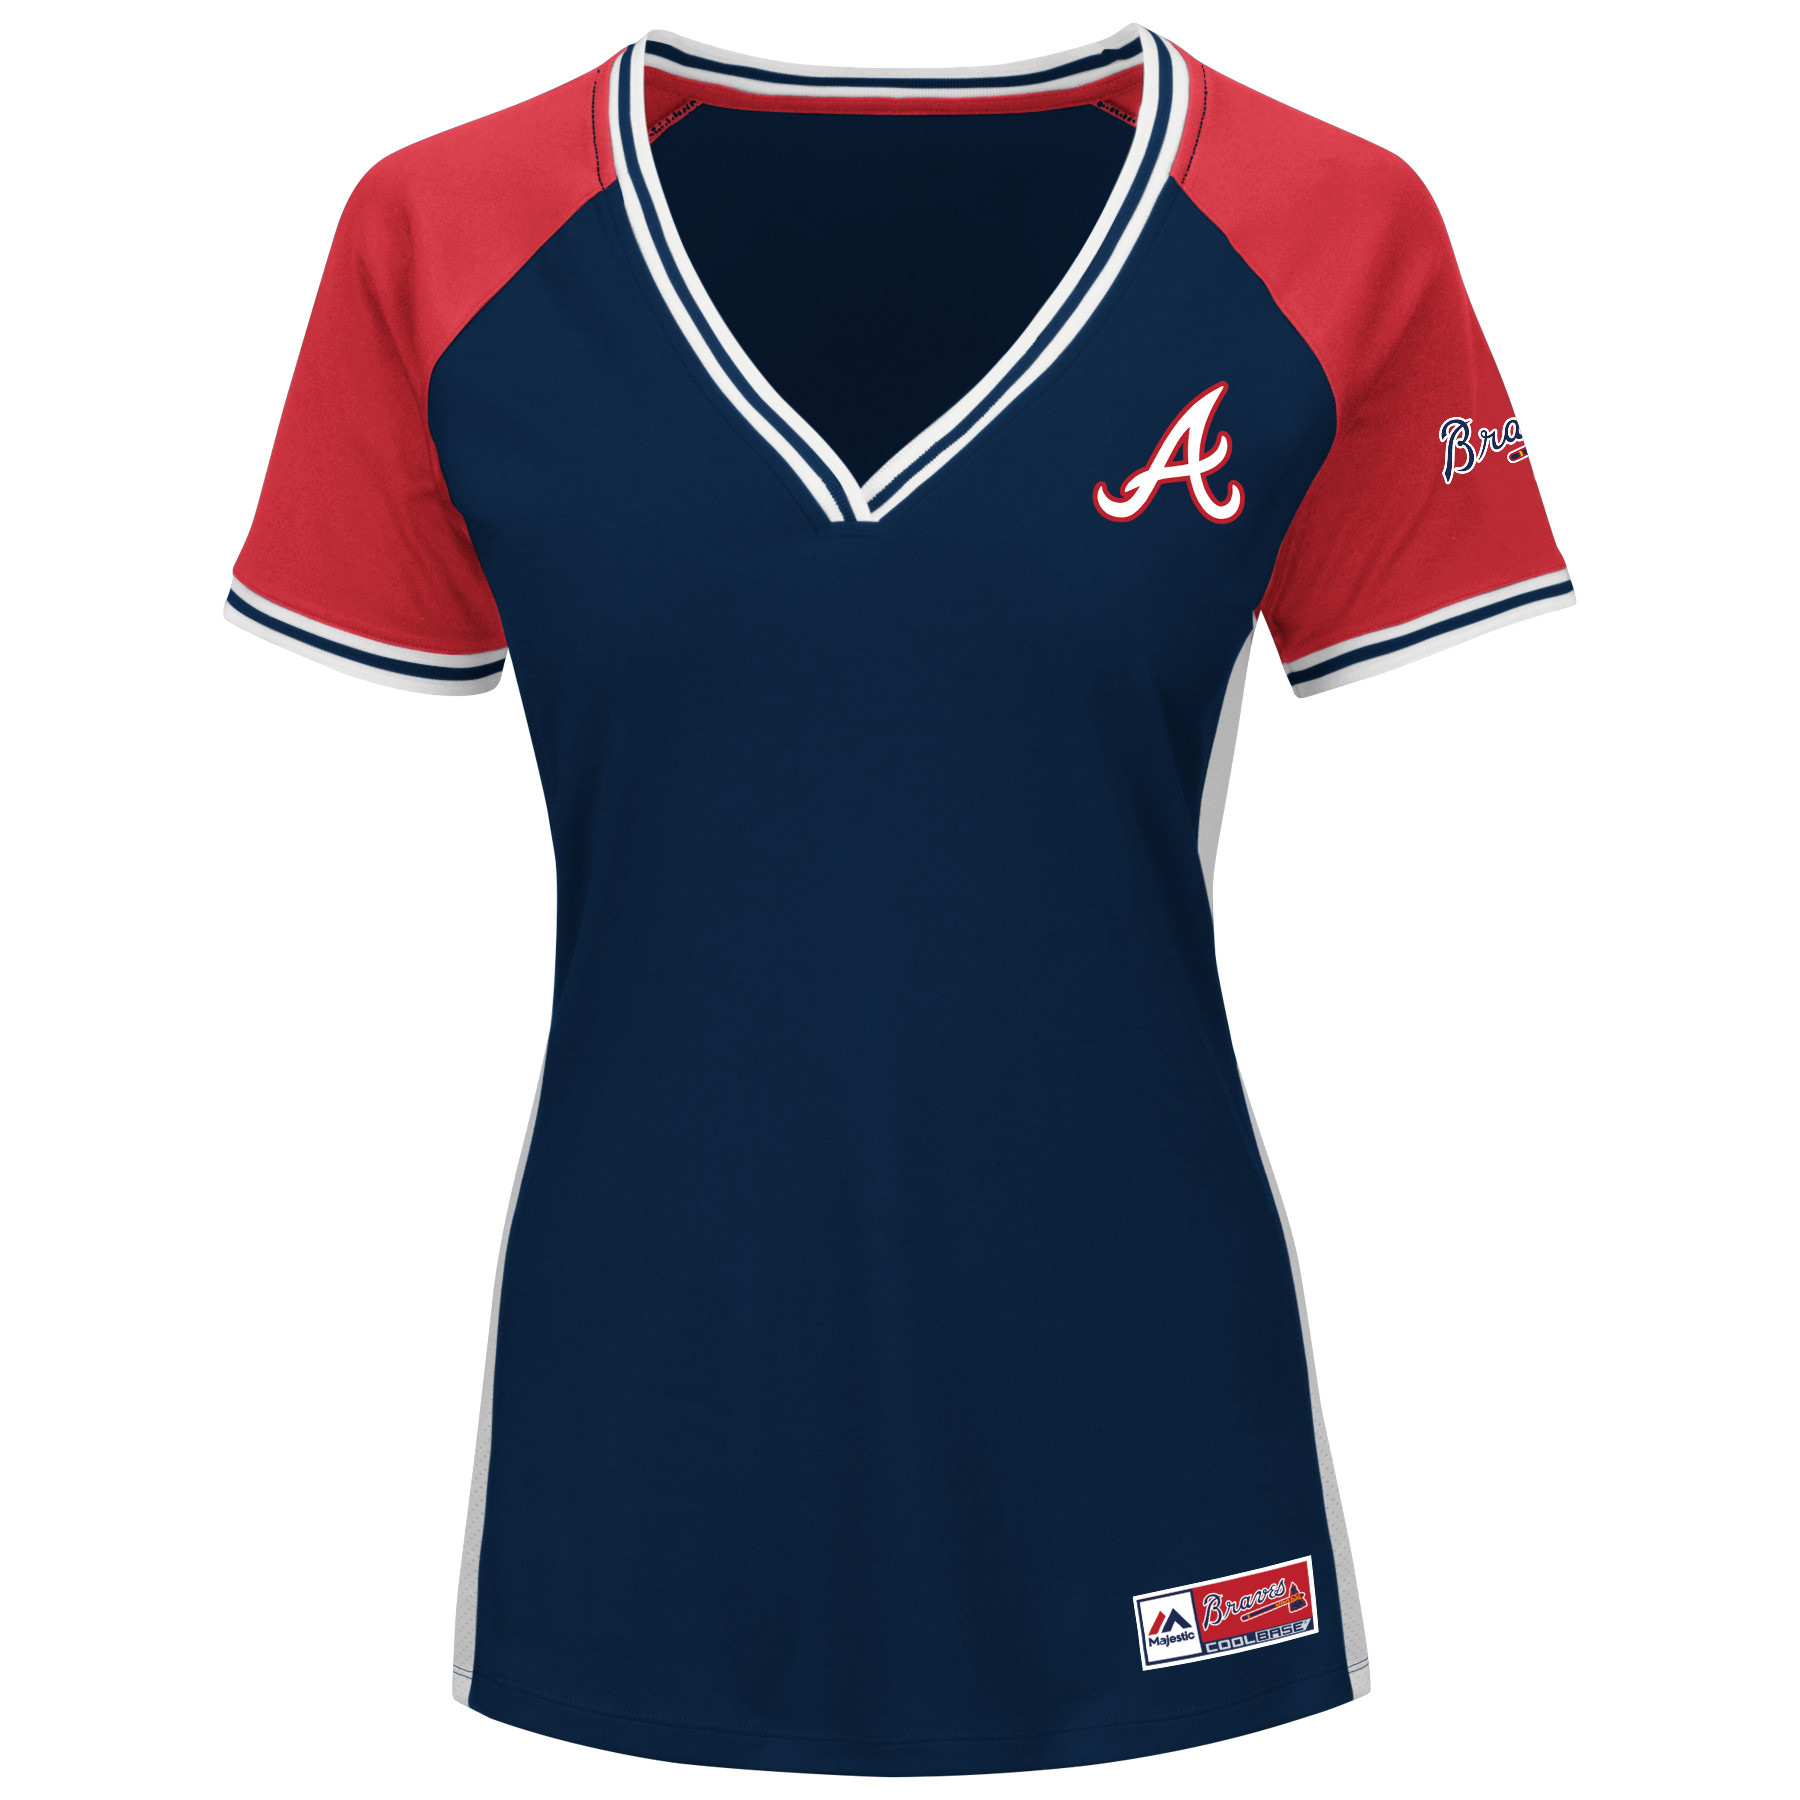 Atlanta Braves Majestic Women's Plus Size League Diva Cool Base V-Neck T-Shirt Navy by Profile